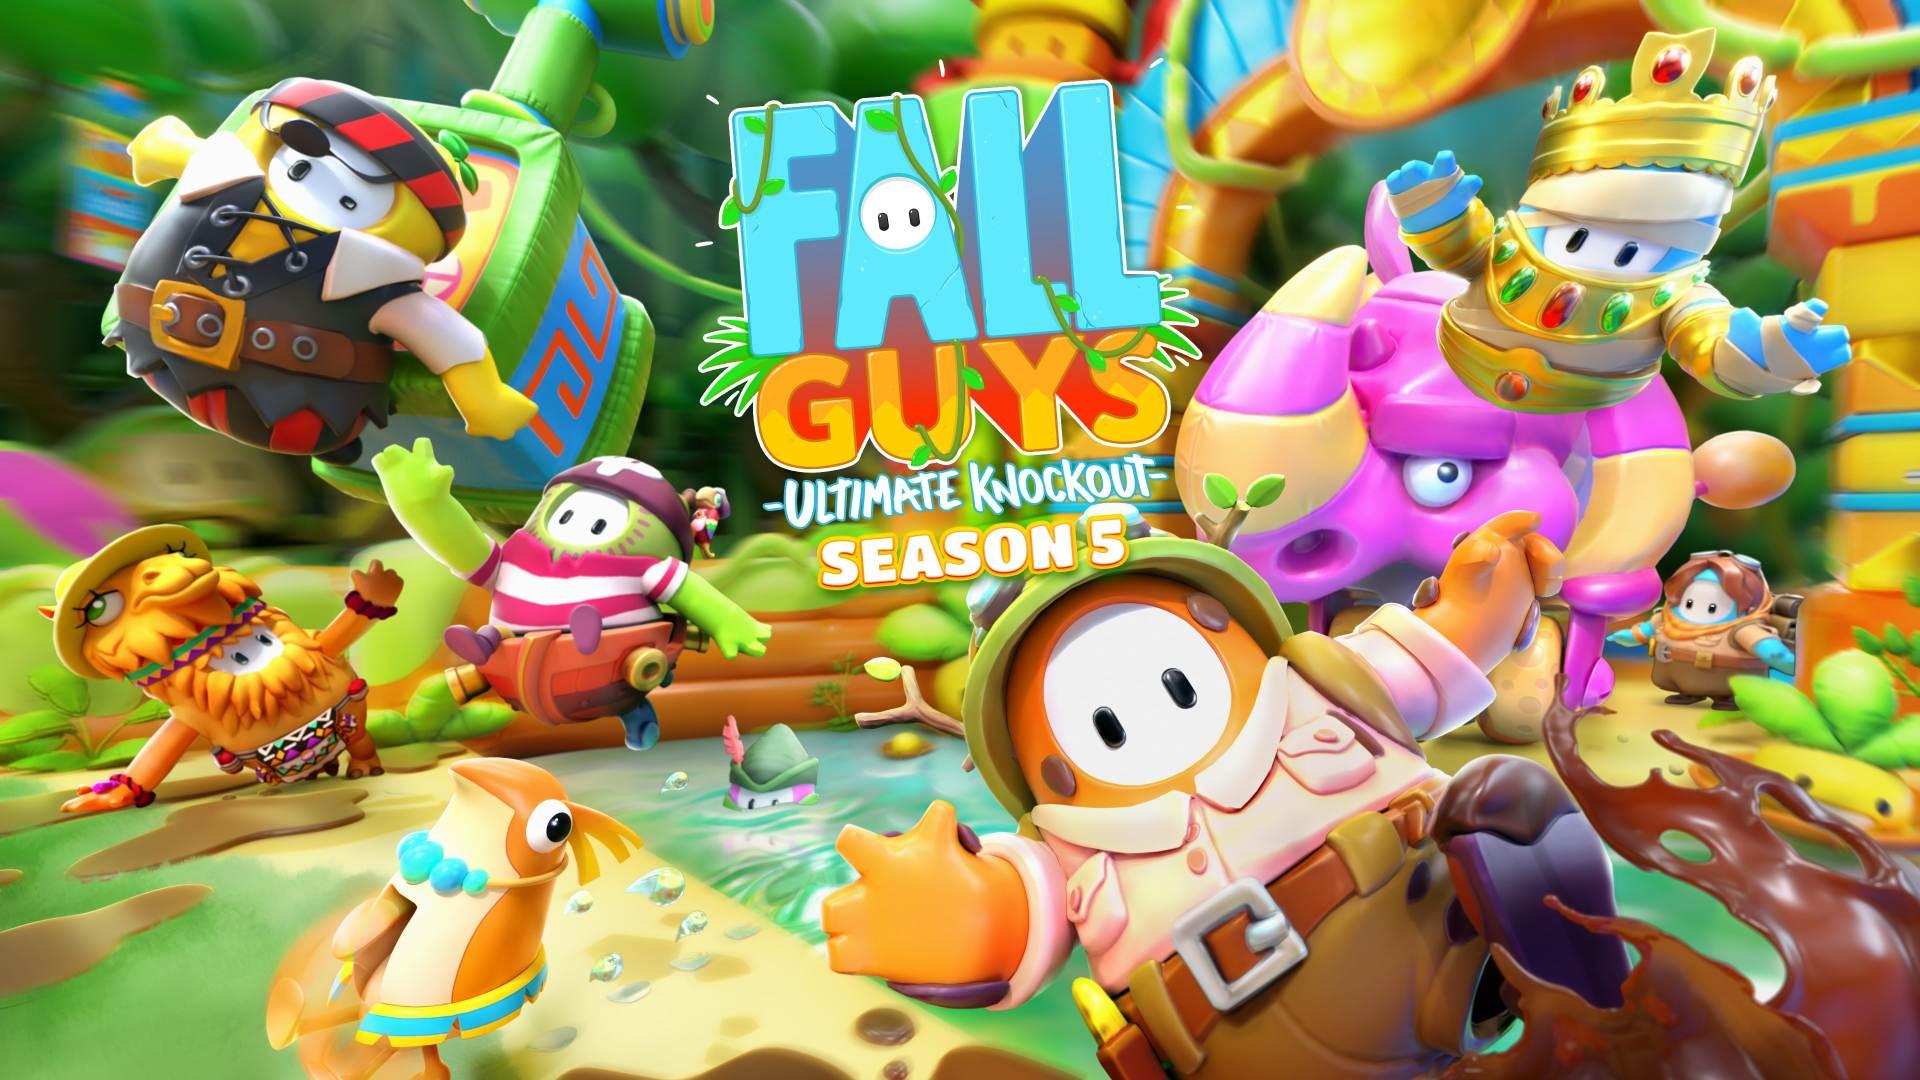 fall guys season 5 promo